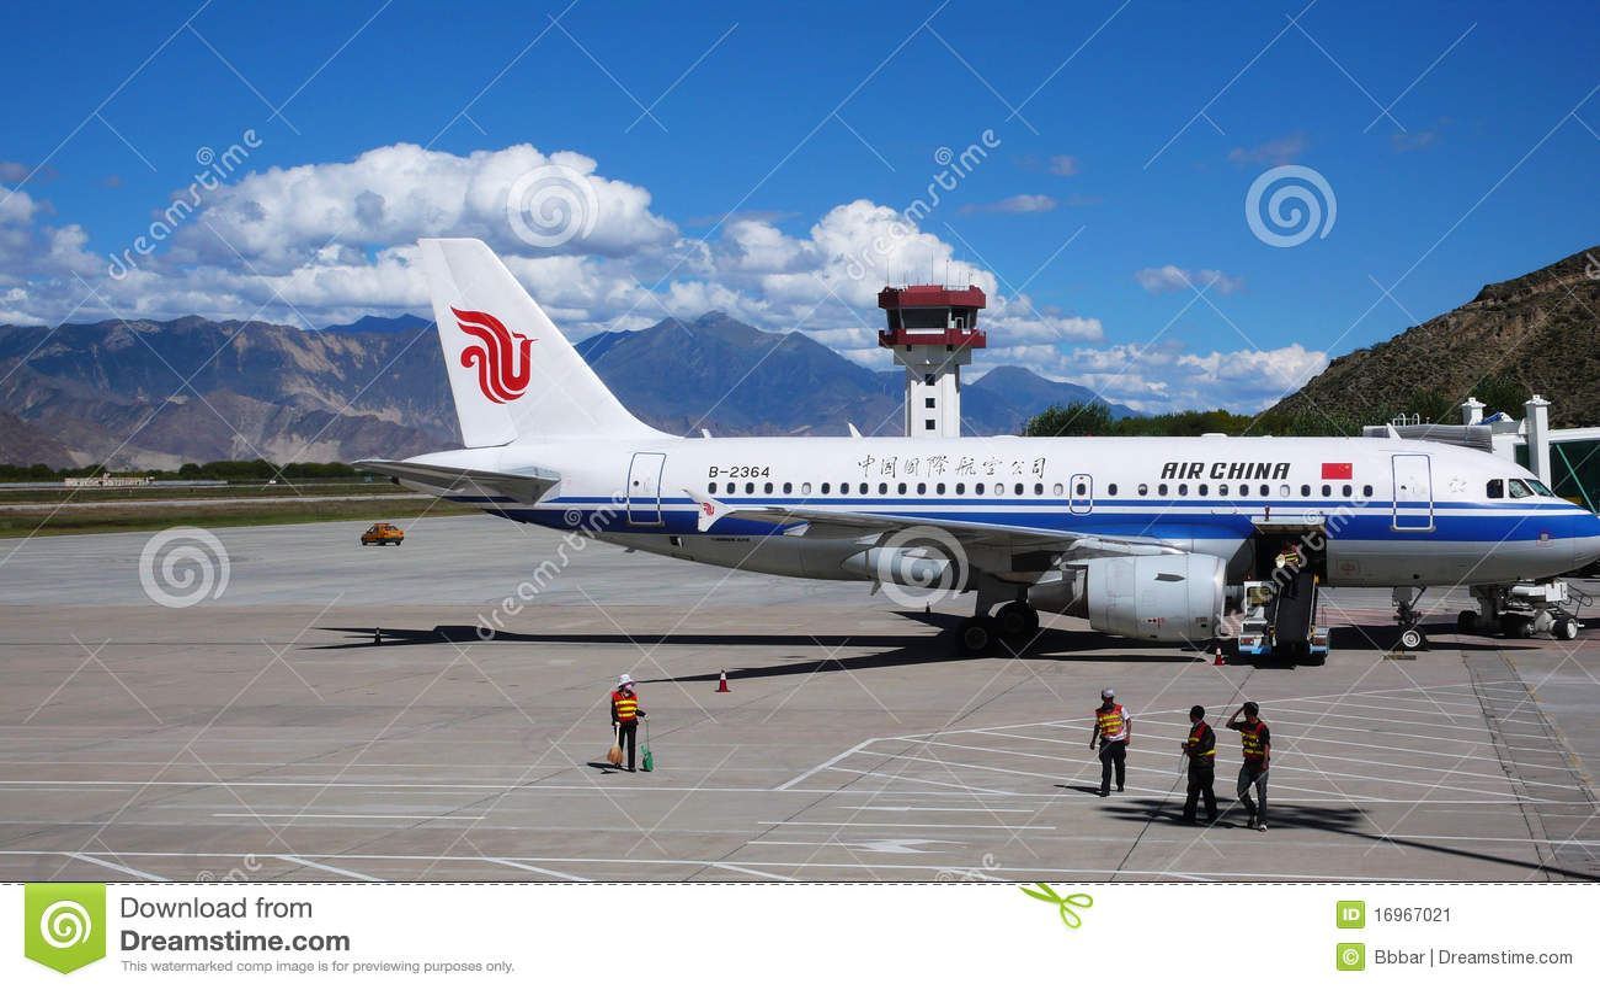 lhasa asian singles Beijing city tour xian tour shanghai tour zhangjiajie tour chengdu tour datong tour guilin tour lhasa tour all  now let see the most romantic places in shanghai.